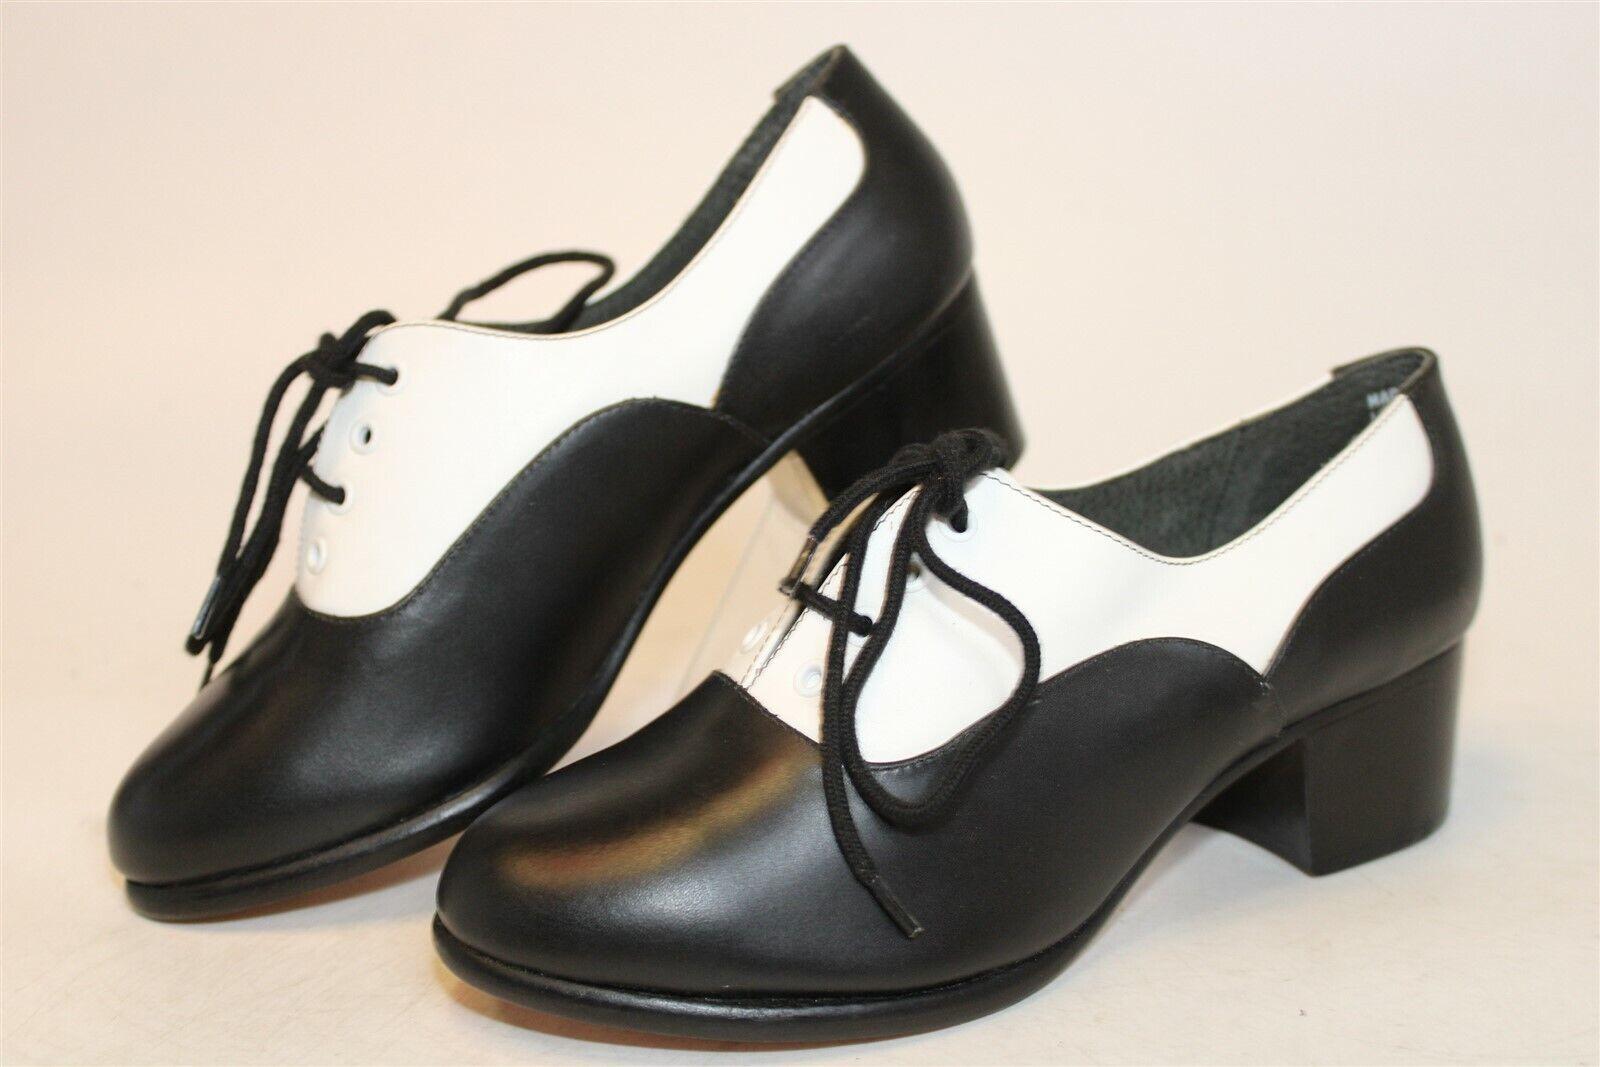 Capezio NEW Womens 5.5 M Leather Lace Up Oxfords Jazz Dance Shoes